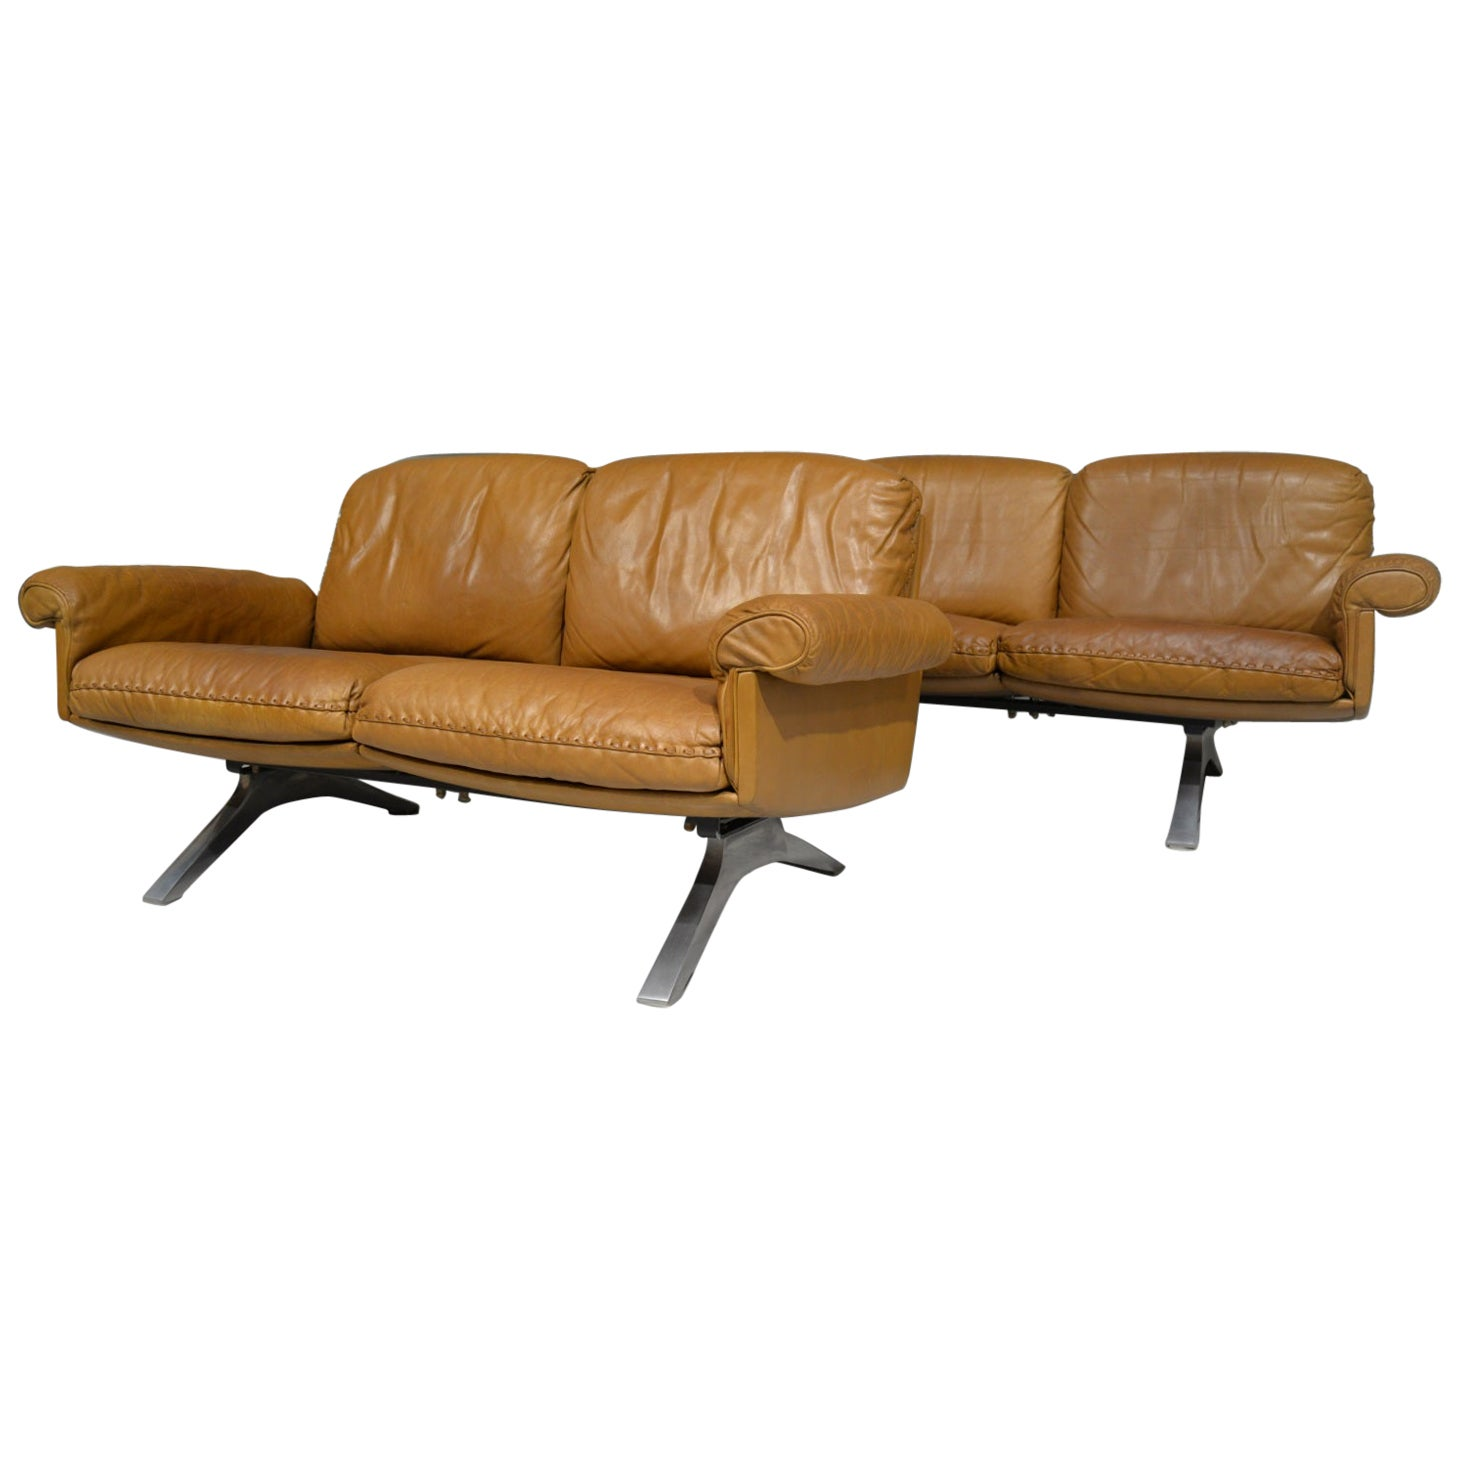 Vintage De Sede DS 31 Leather Sofa and Loveseat, Switzerland 1970s